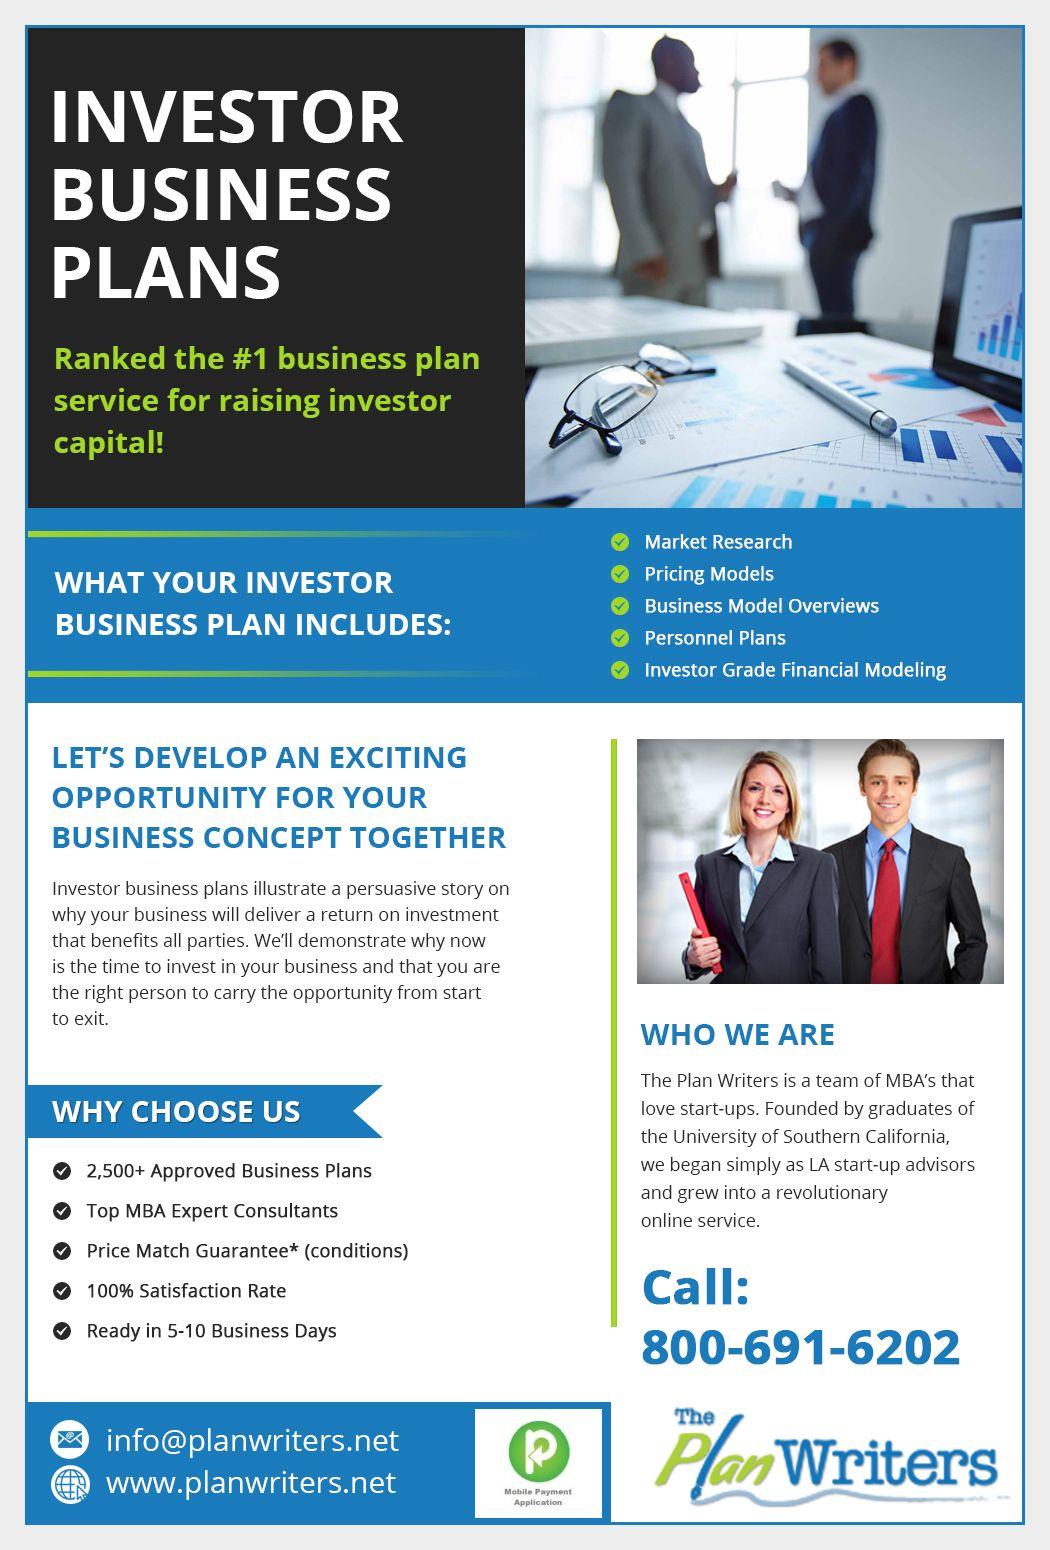 Investor Business Plans Business investors, Business